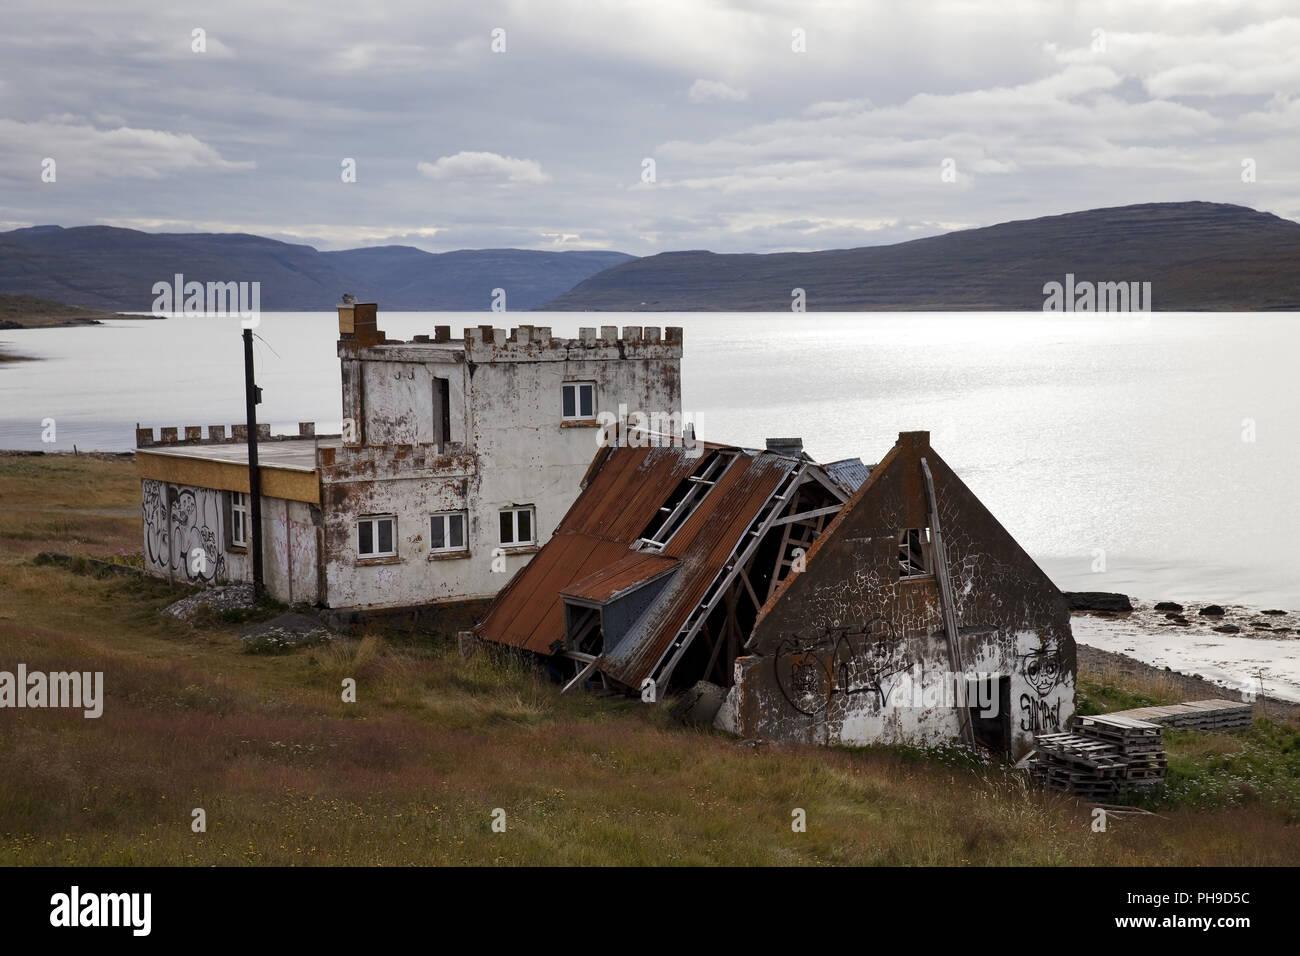 Verfallene Häuser am Fjord Isafjoerdur, Westfjorde, Island Stockbild